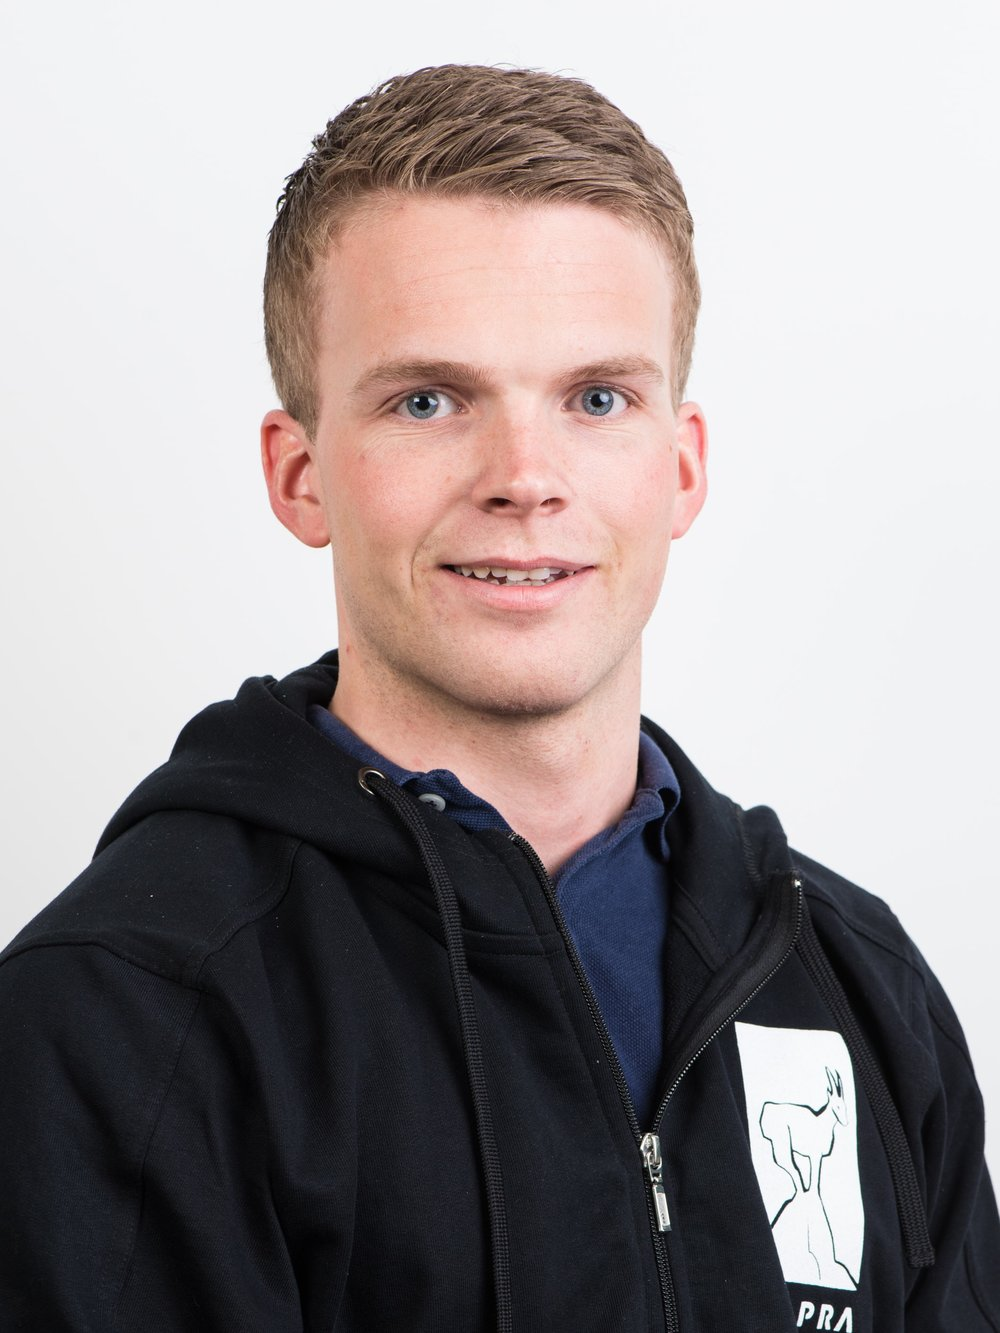 Morten Fossmark